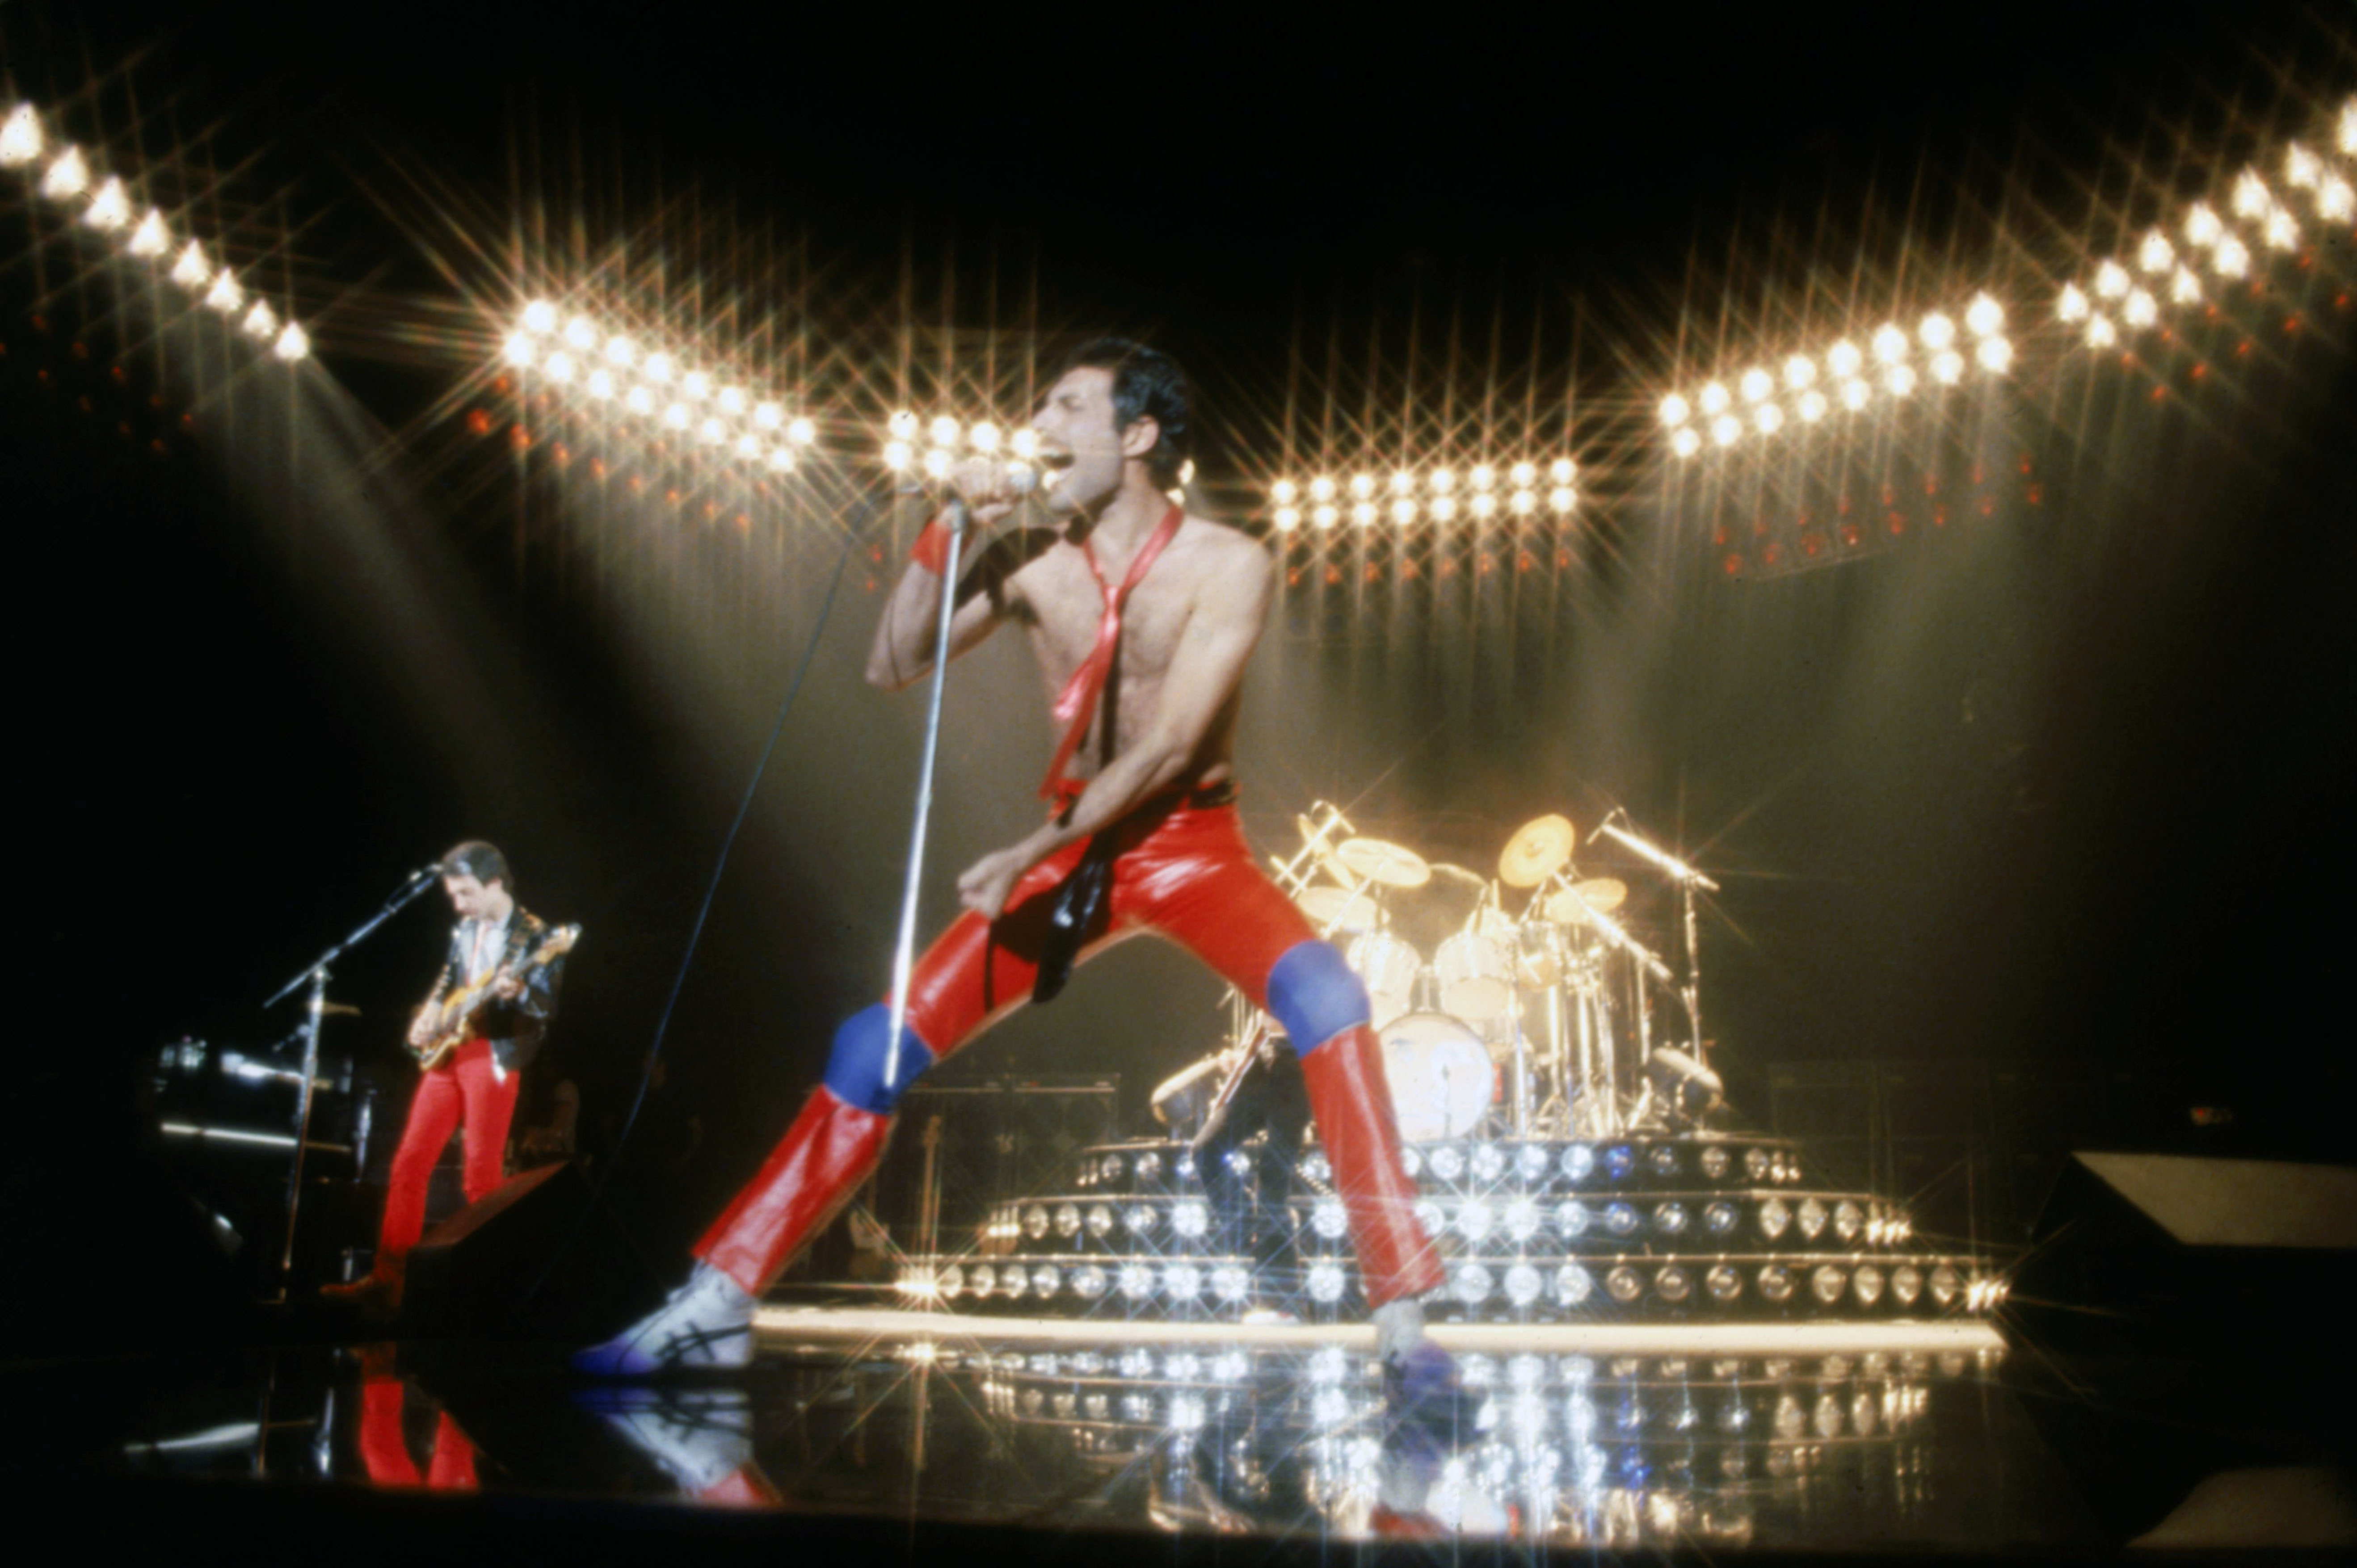 Musician John Deacon and Freddie Mercury  (C)(1946 - 1991) of British rock band Queen in concert, 1980.